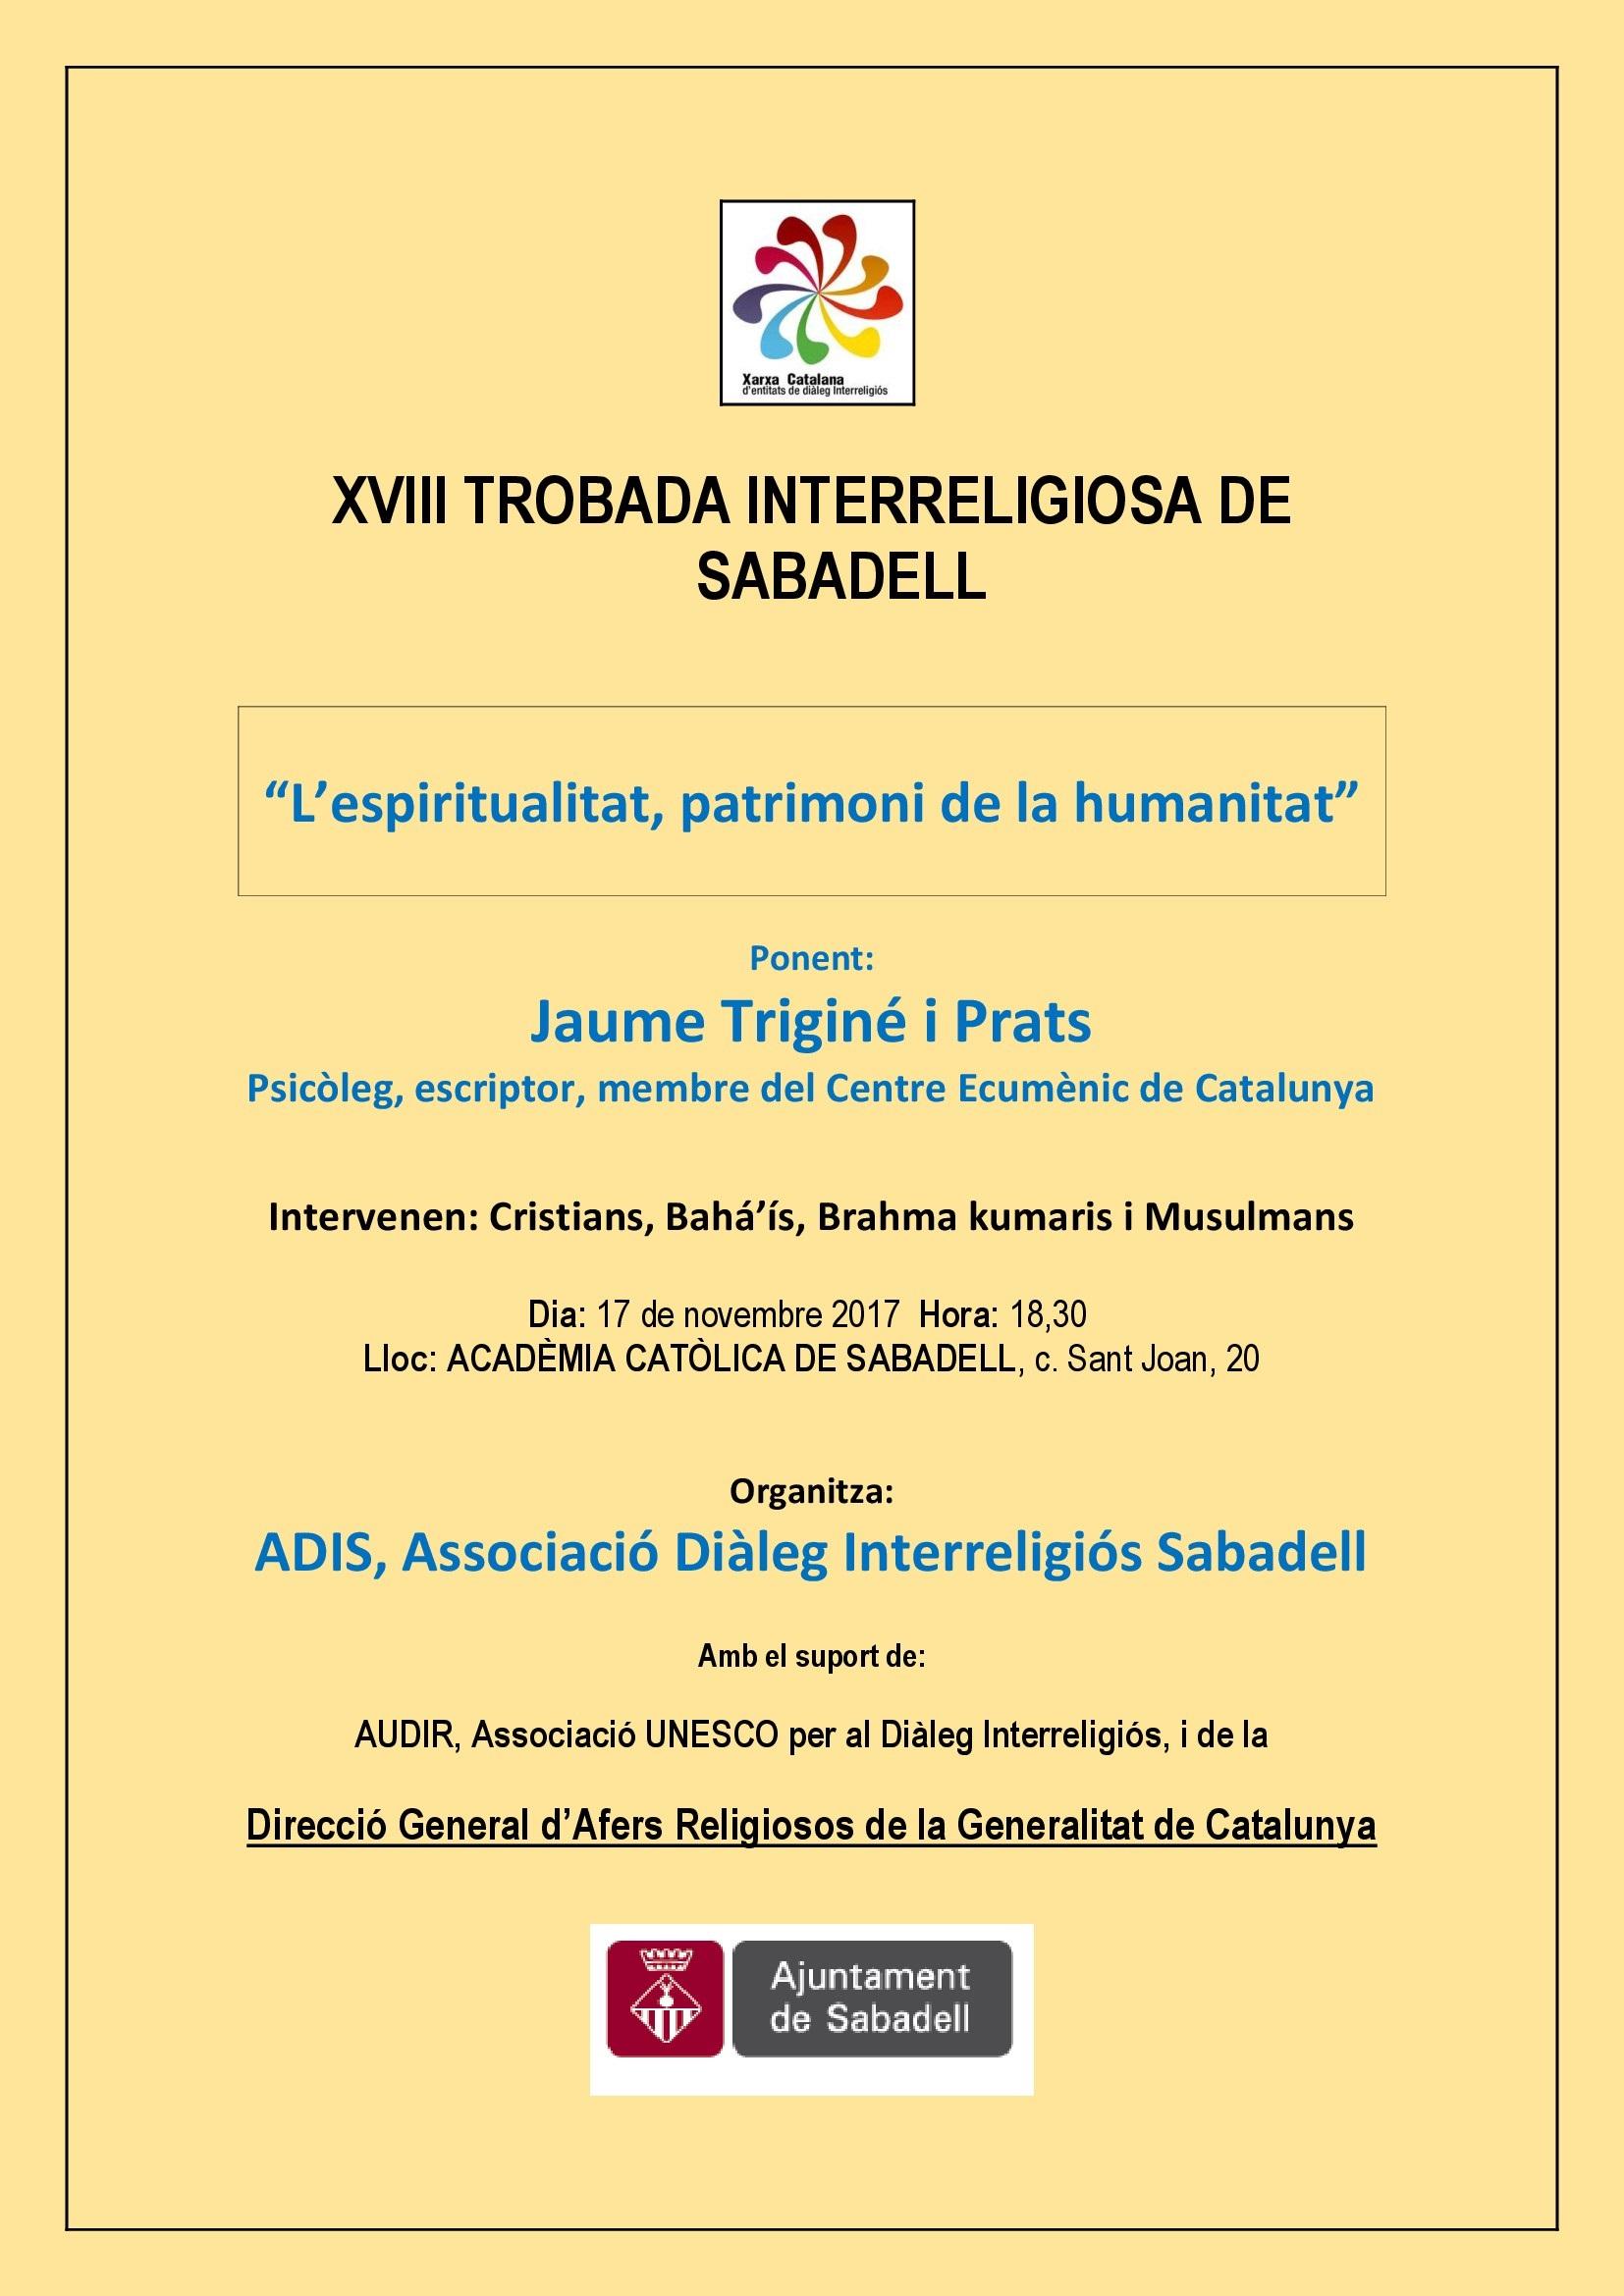 TROBADA-INTERRELIGIOSA-SABADELL